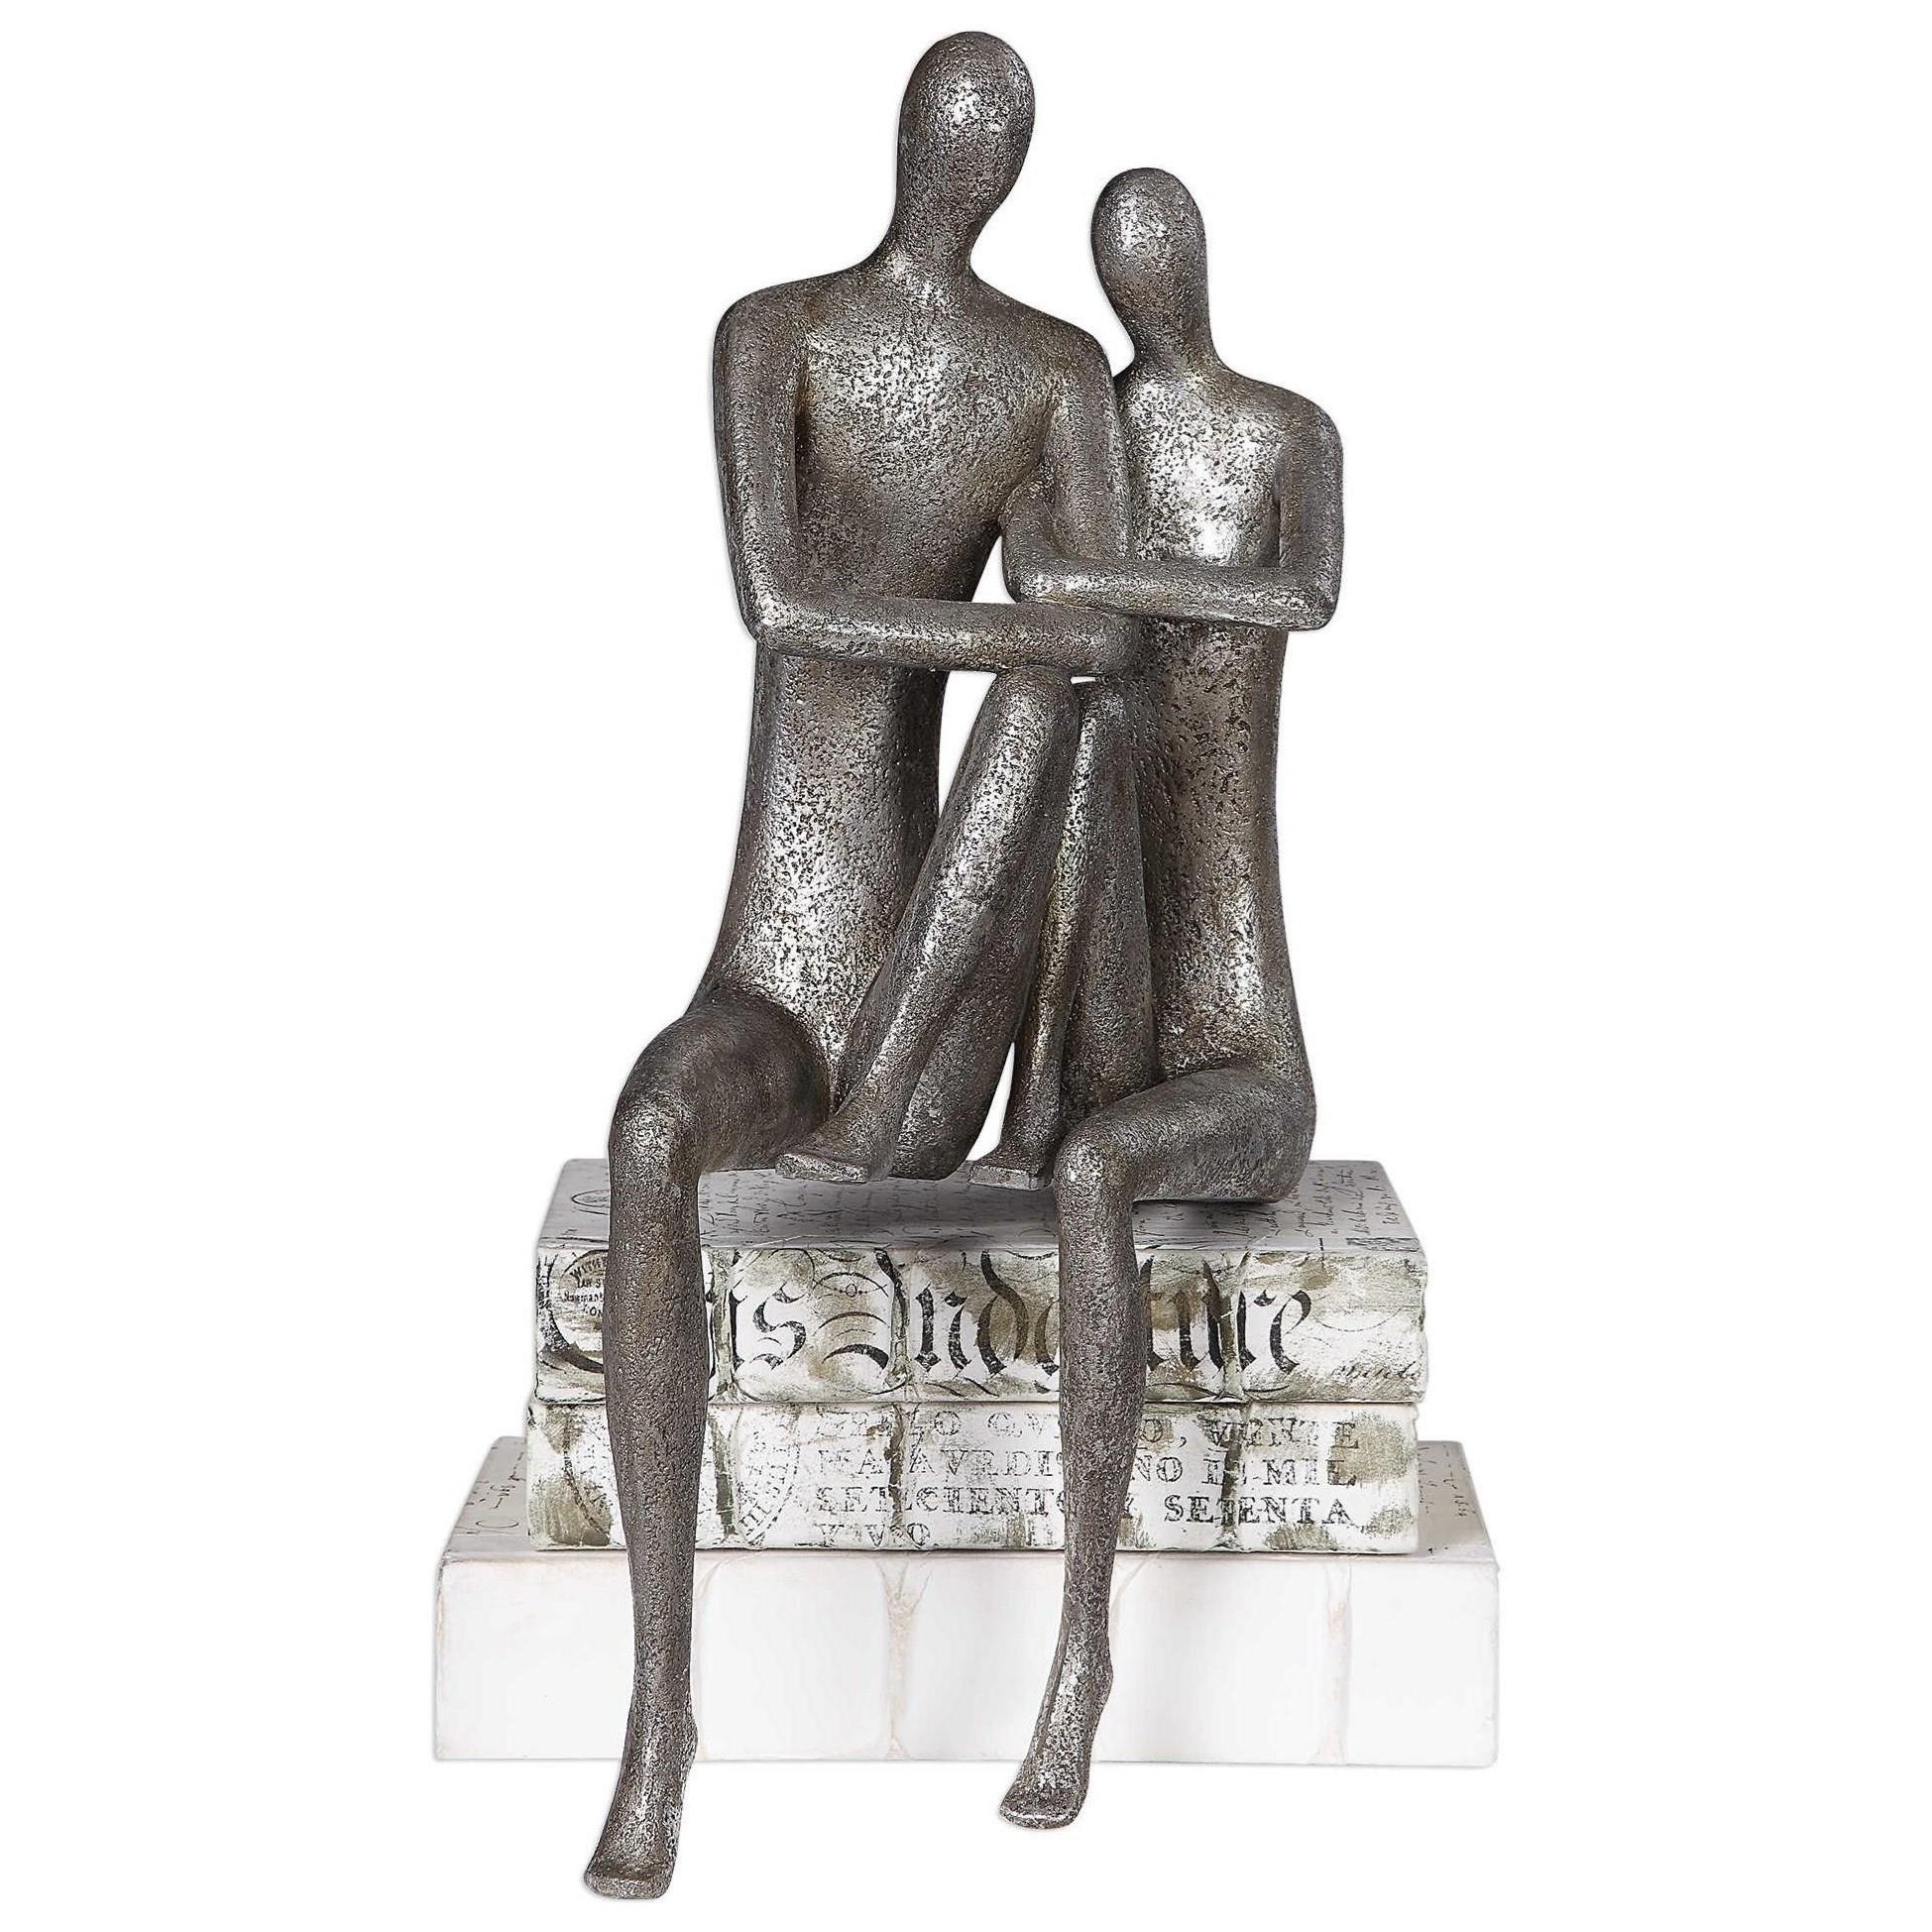 Courtship Antique Nickel Figurine